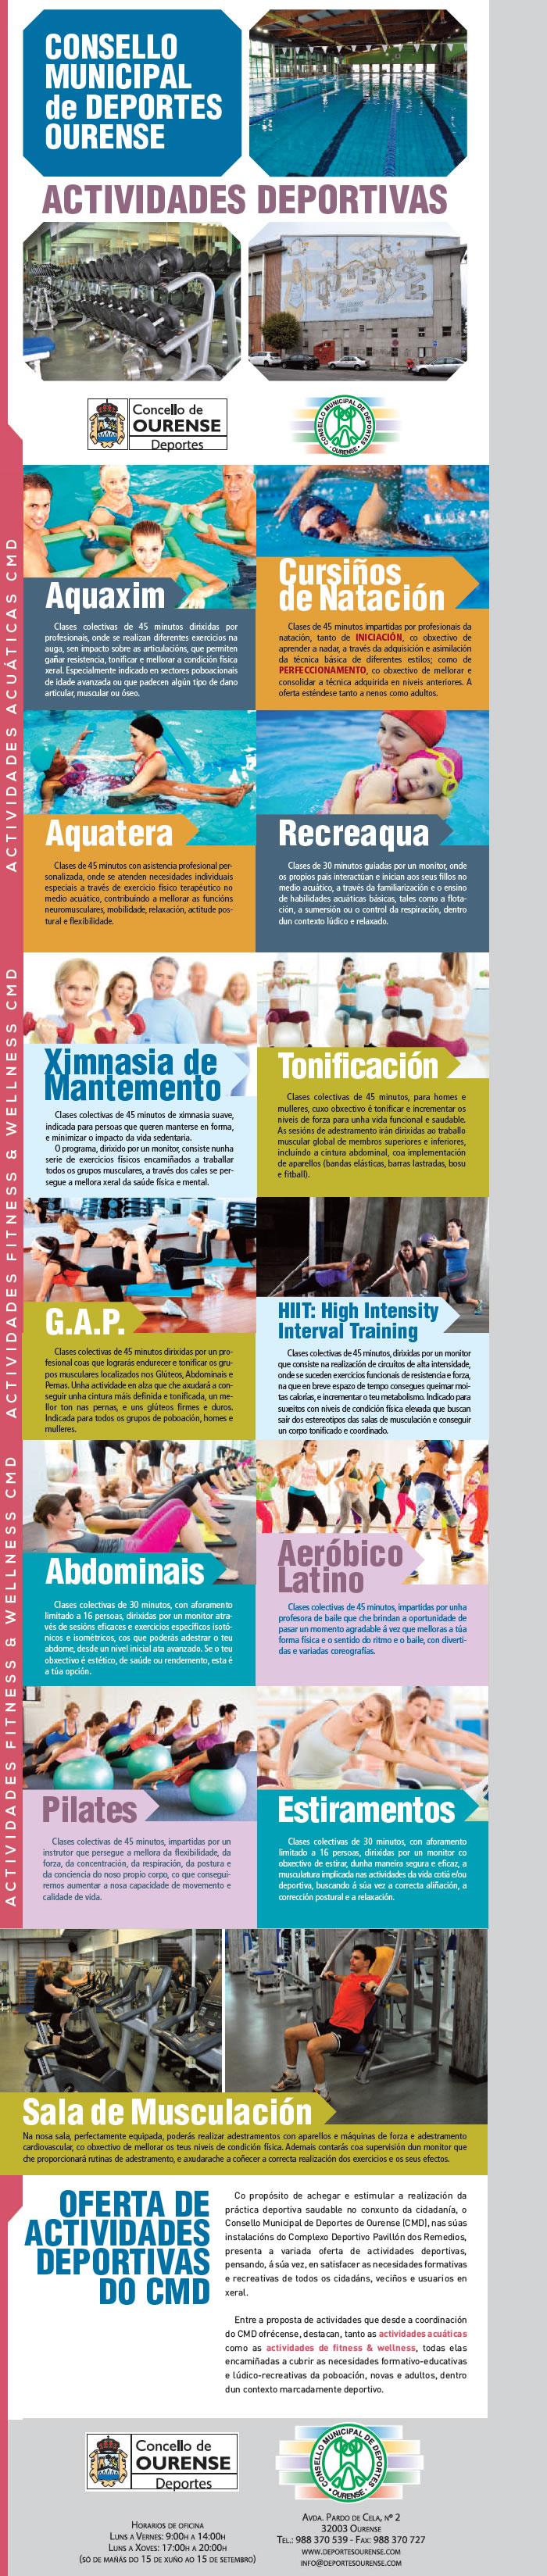 http://www.ourensedixital.com/_cmd/serie2/ra/2017_actividades.jpg